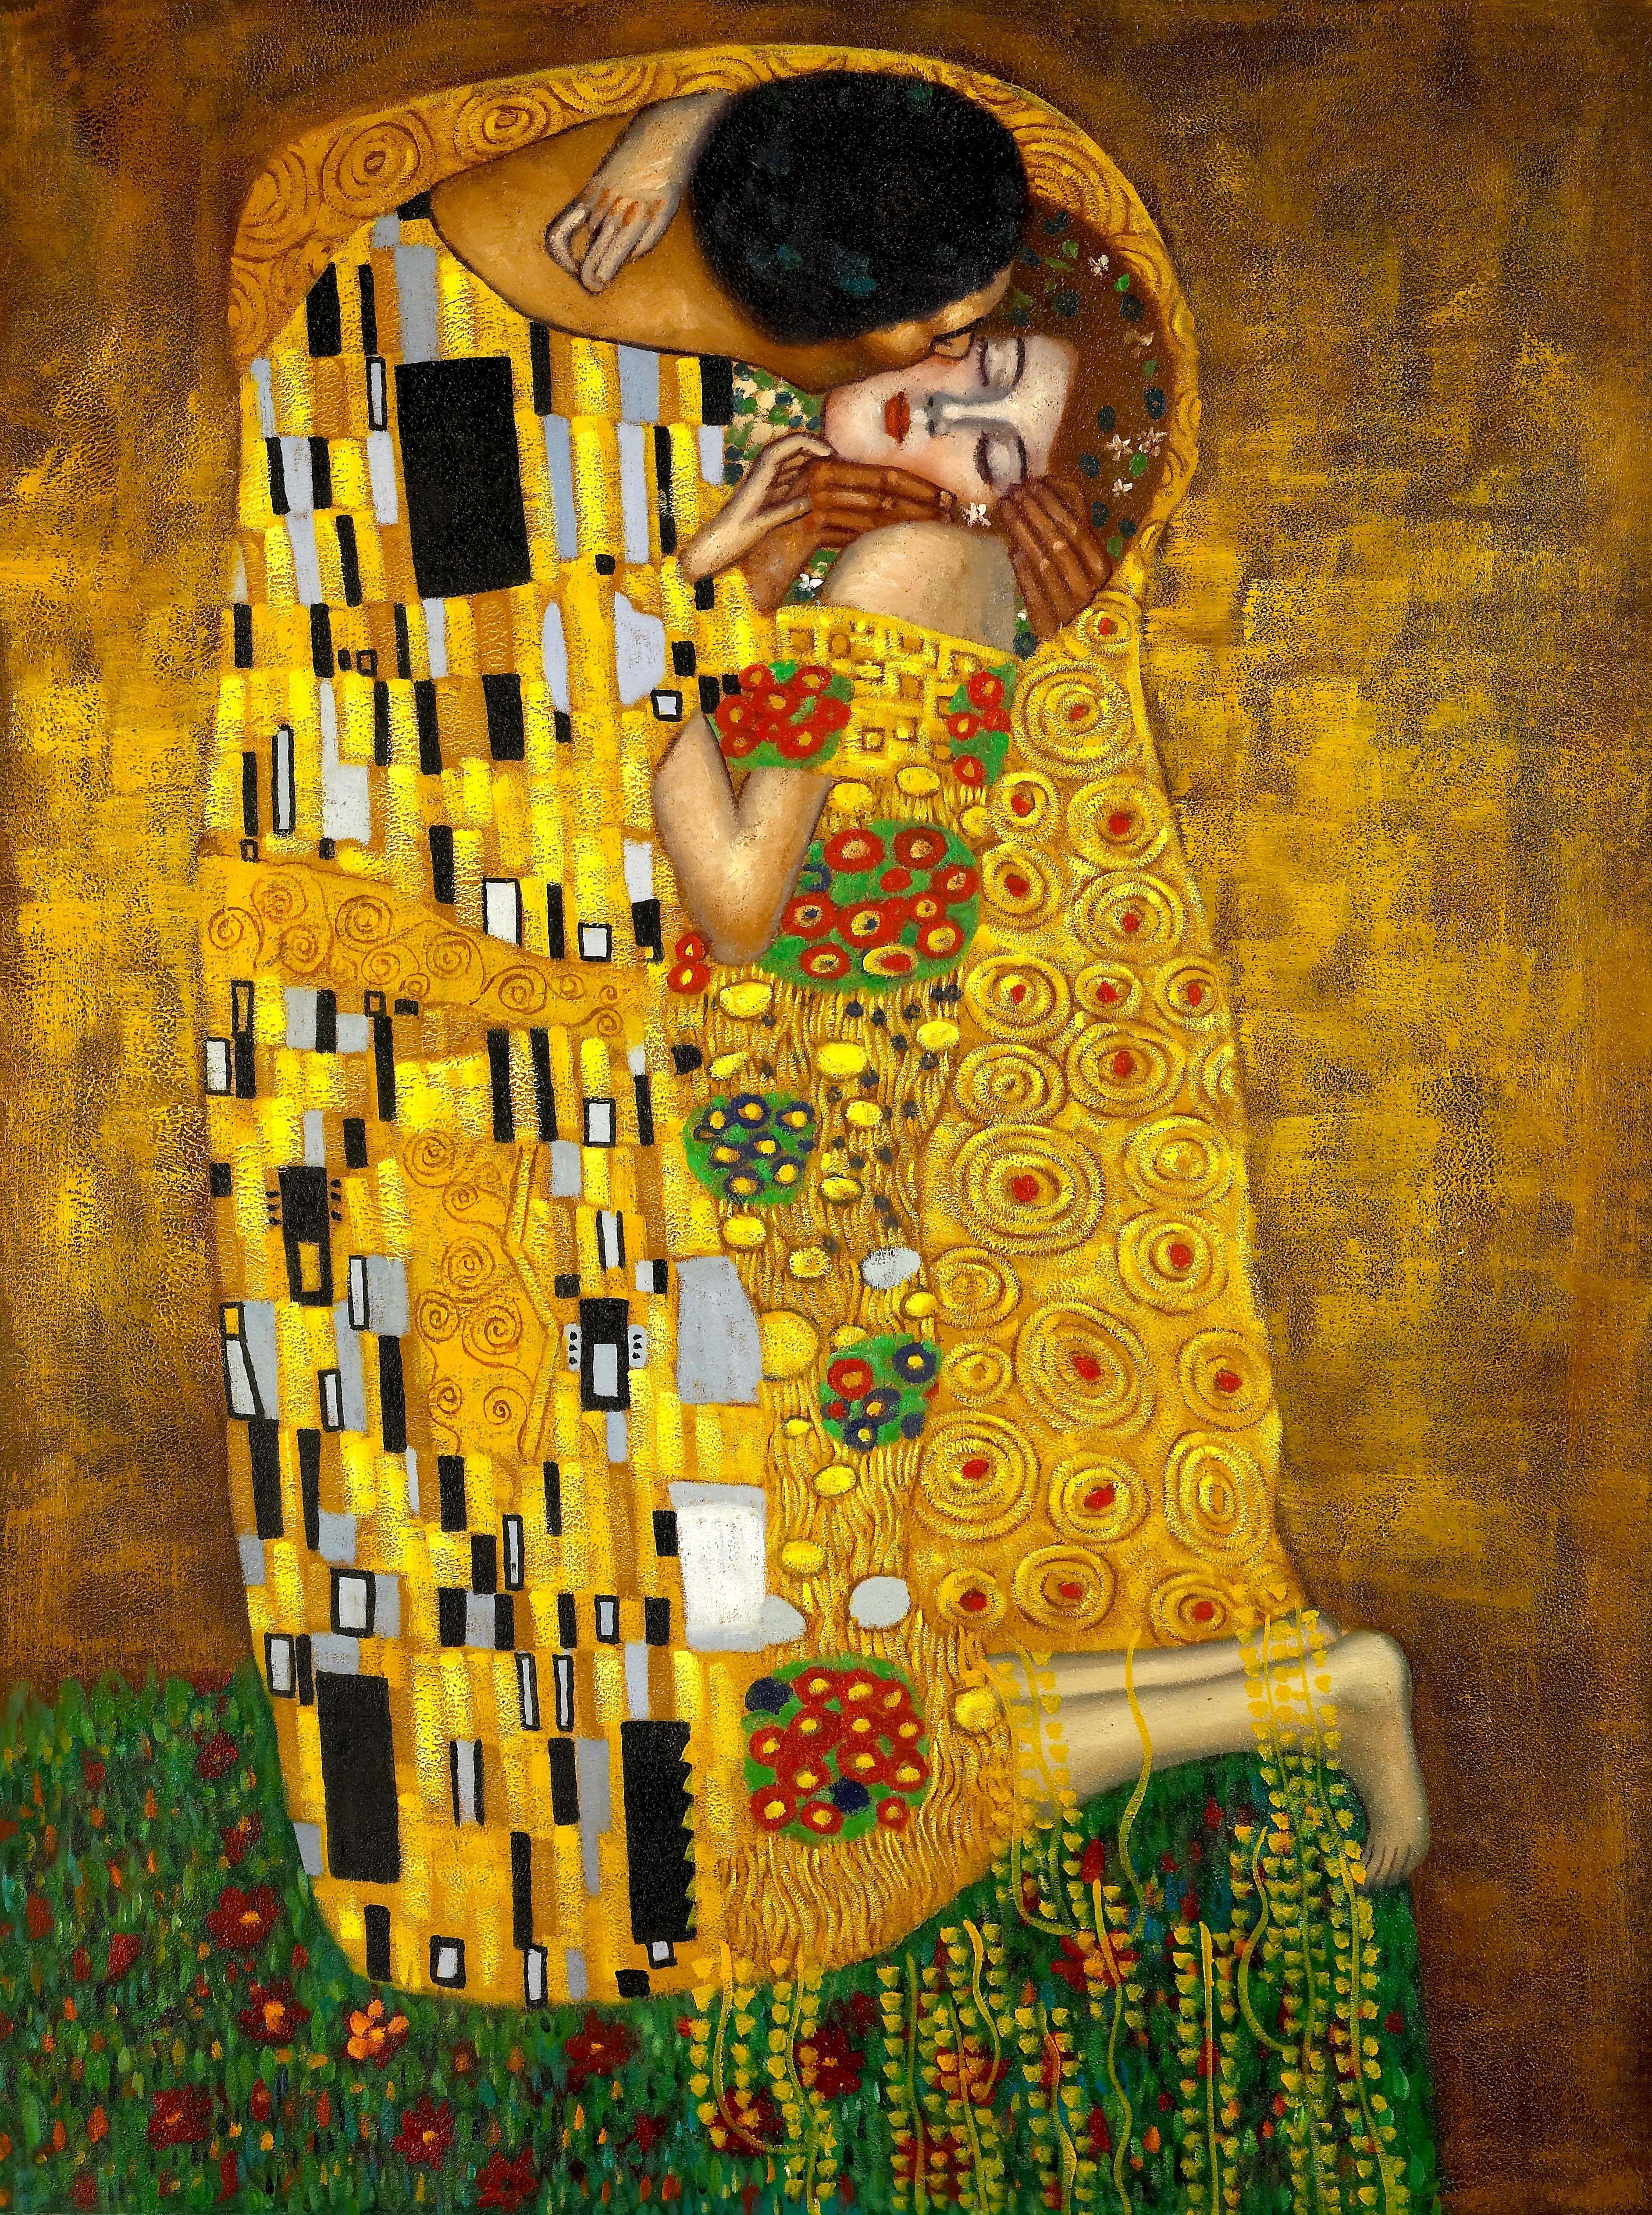 the kiss by G, Klimt   art   Pinterest   Klimt, Kiss and ...